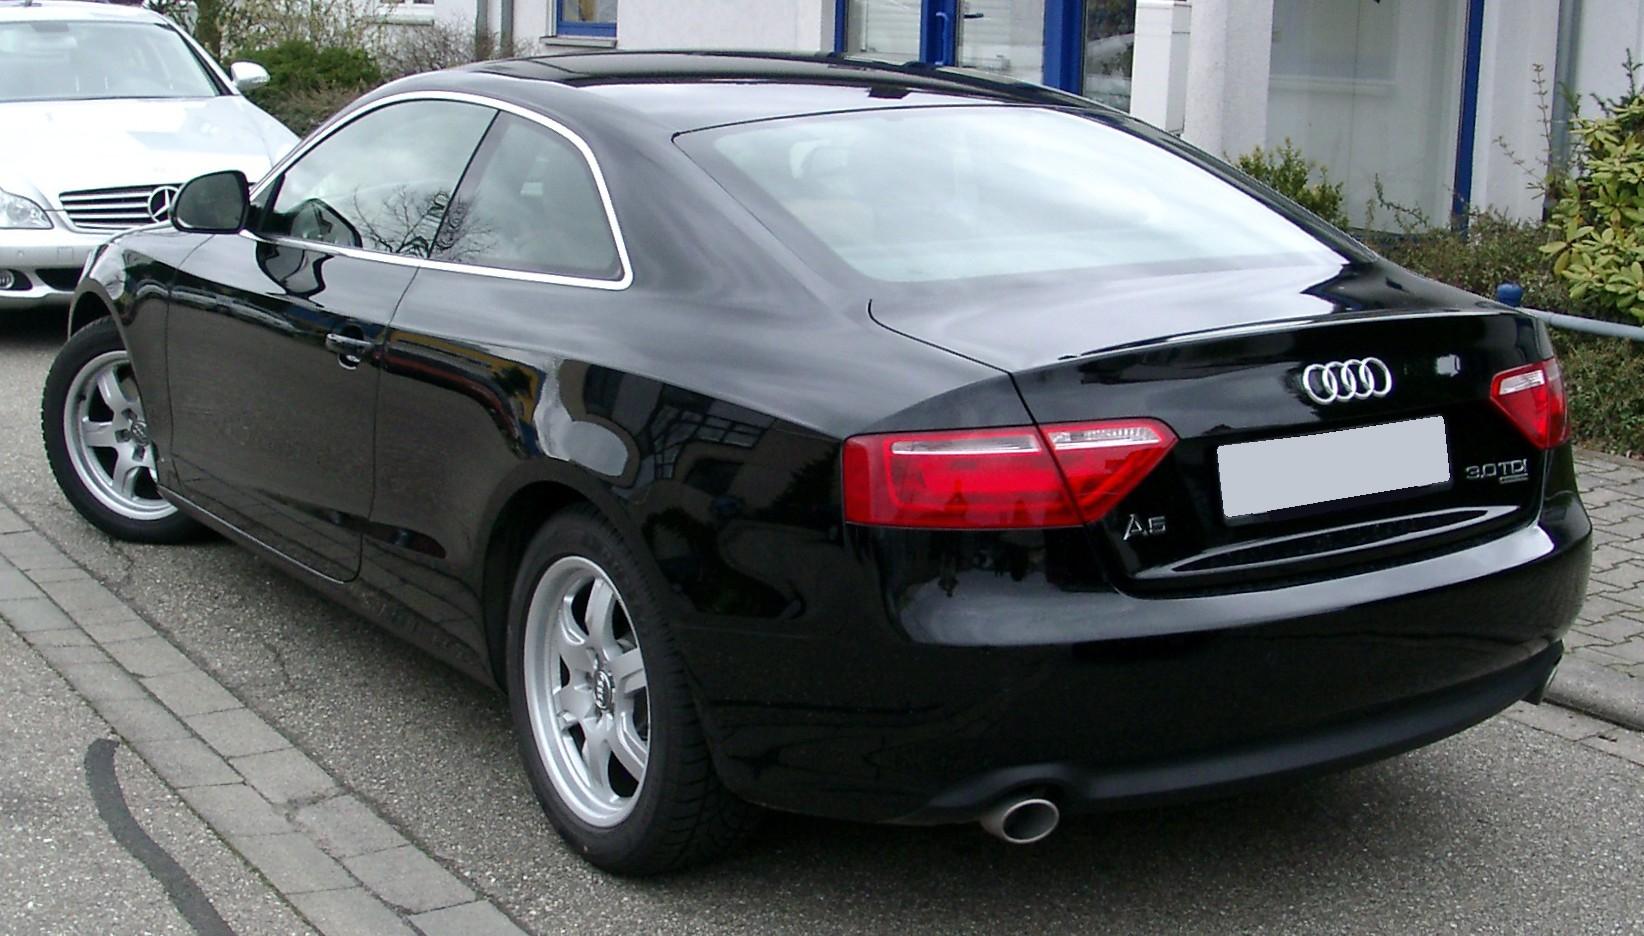 2008 Audi A5 Image 15